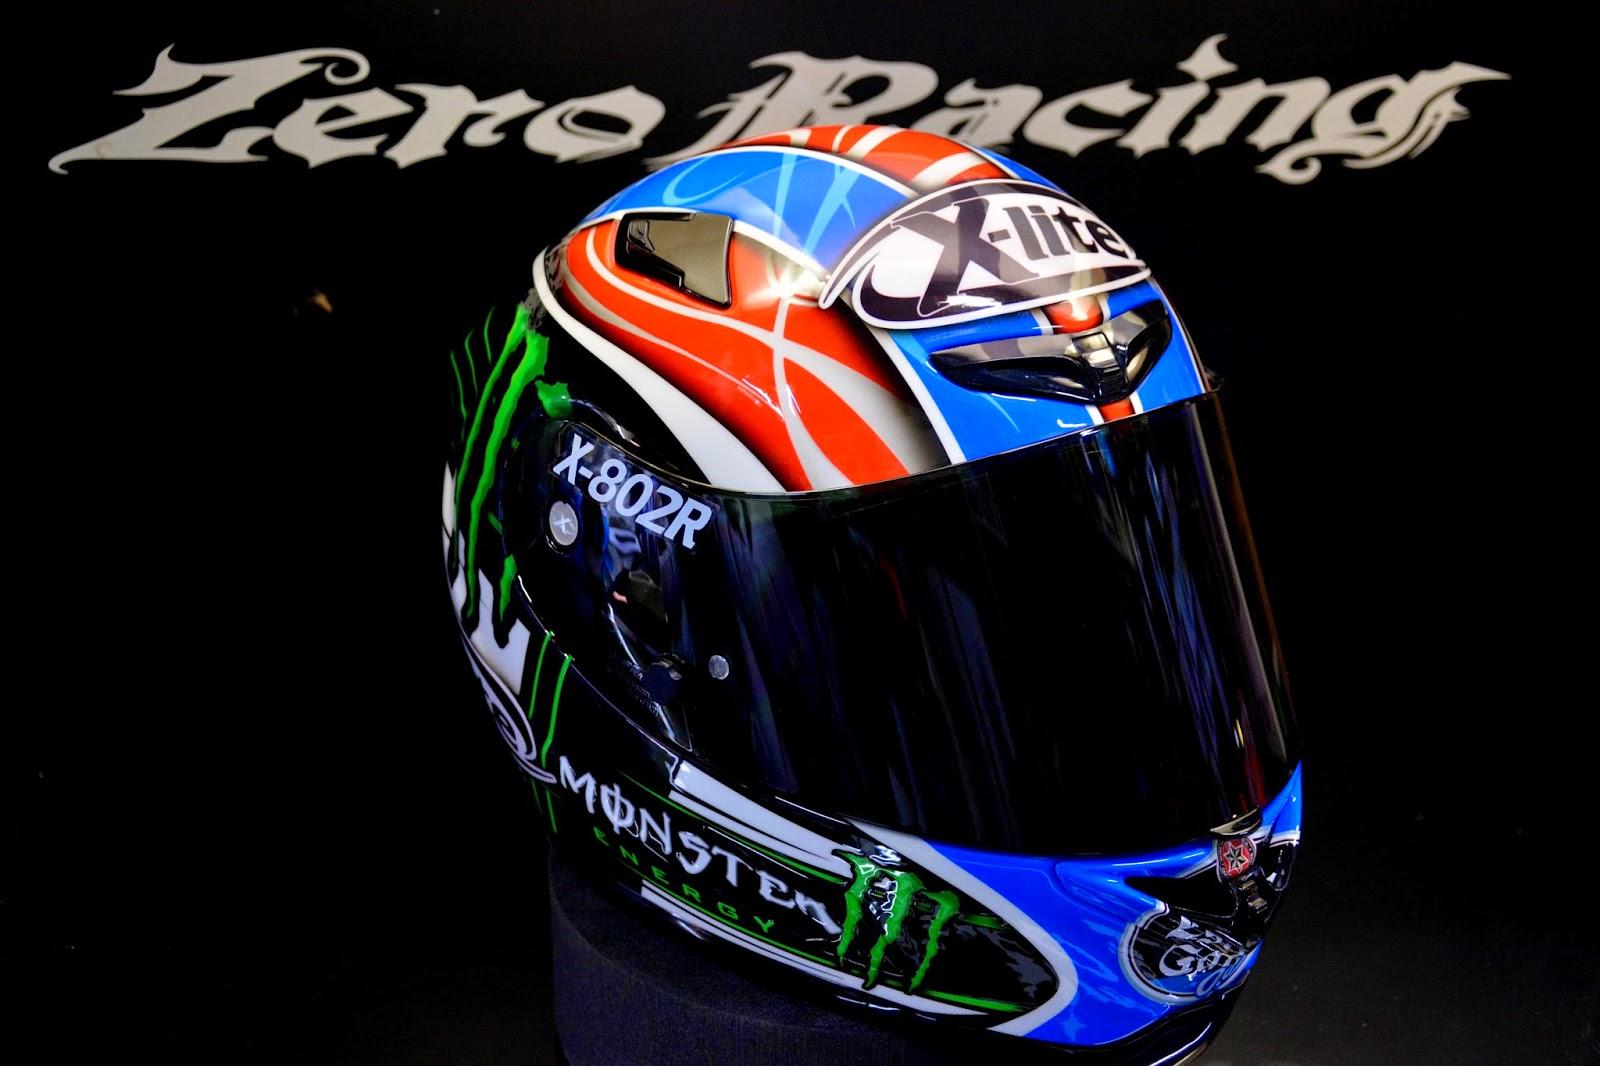 racing helmets garage x lite x 802r j masia 2015 by zero racing. Black Bedroom Furniture Sets. Home Design Ideas